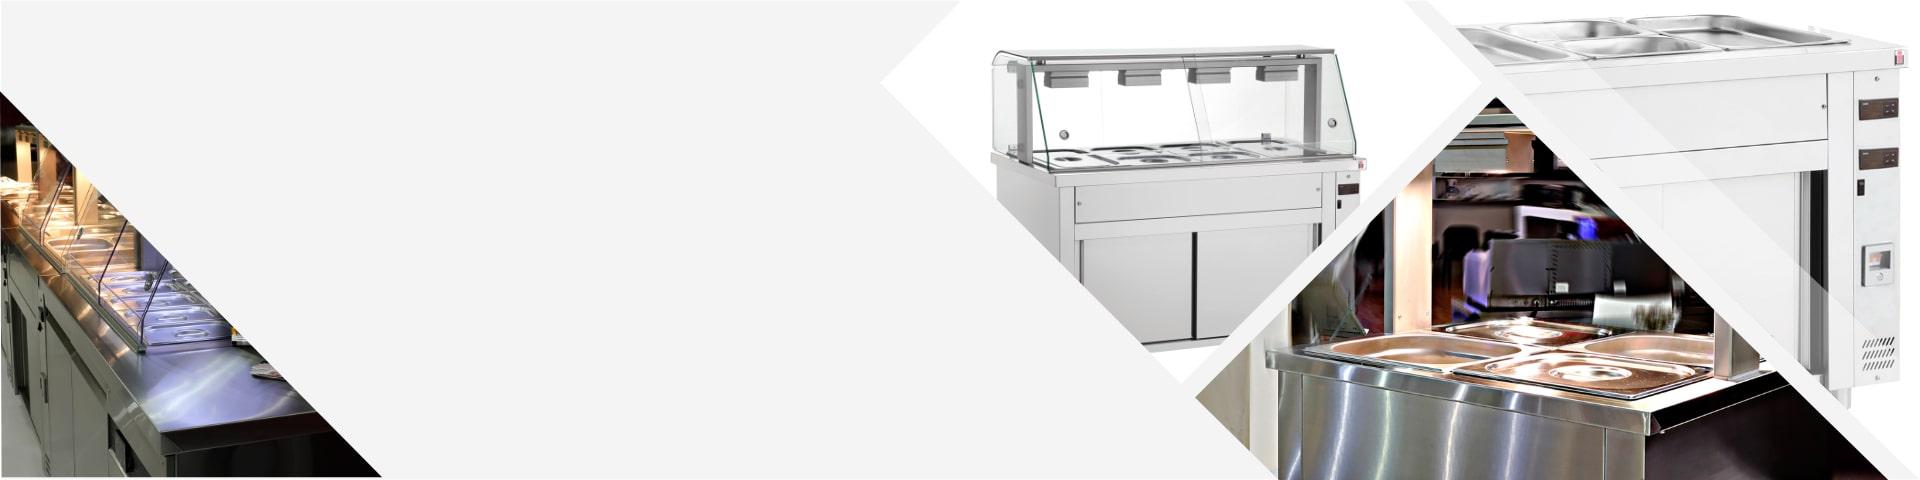 Commercial Refrigerators -Επαγγελματικά Ψυγεία Banner | Inomak